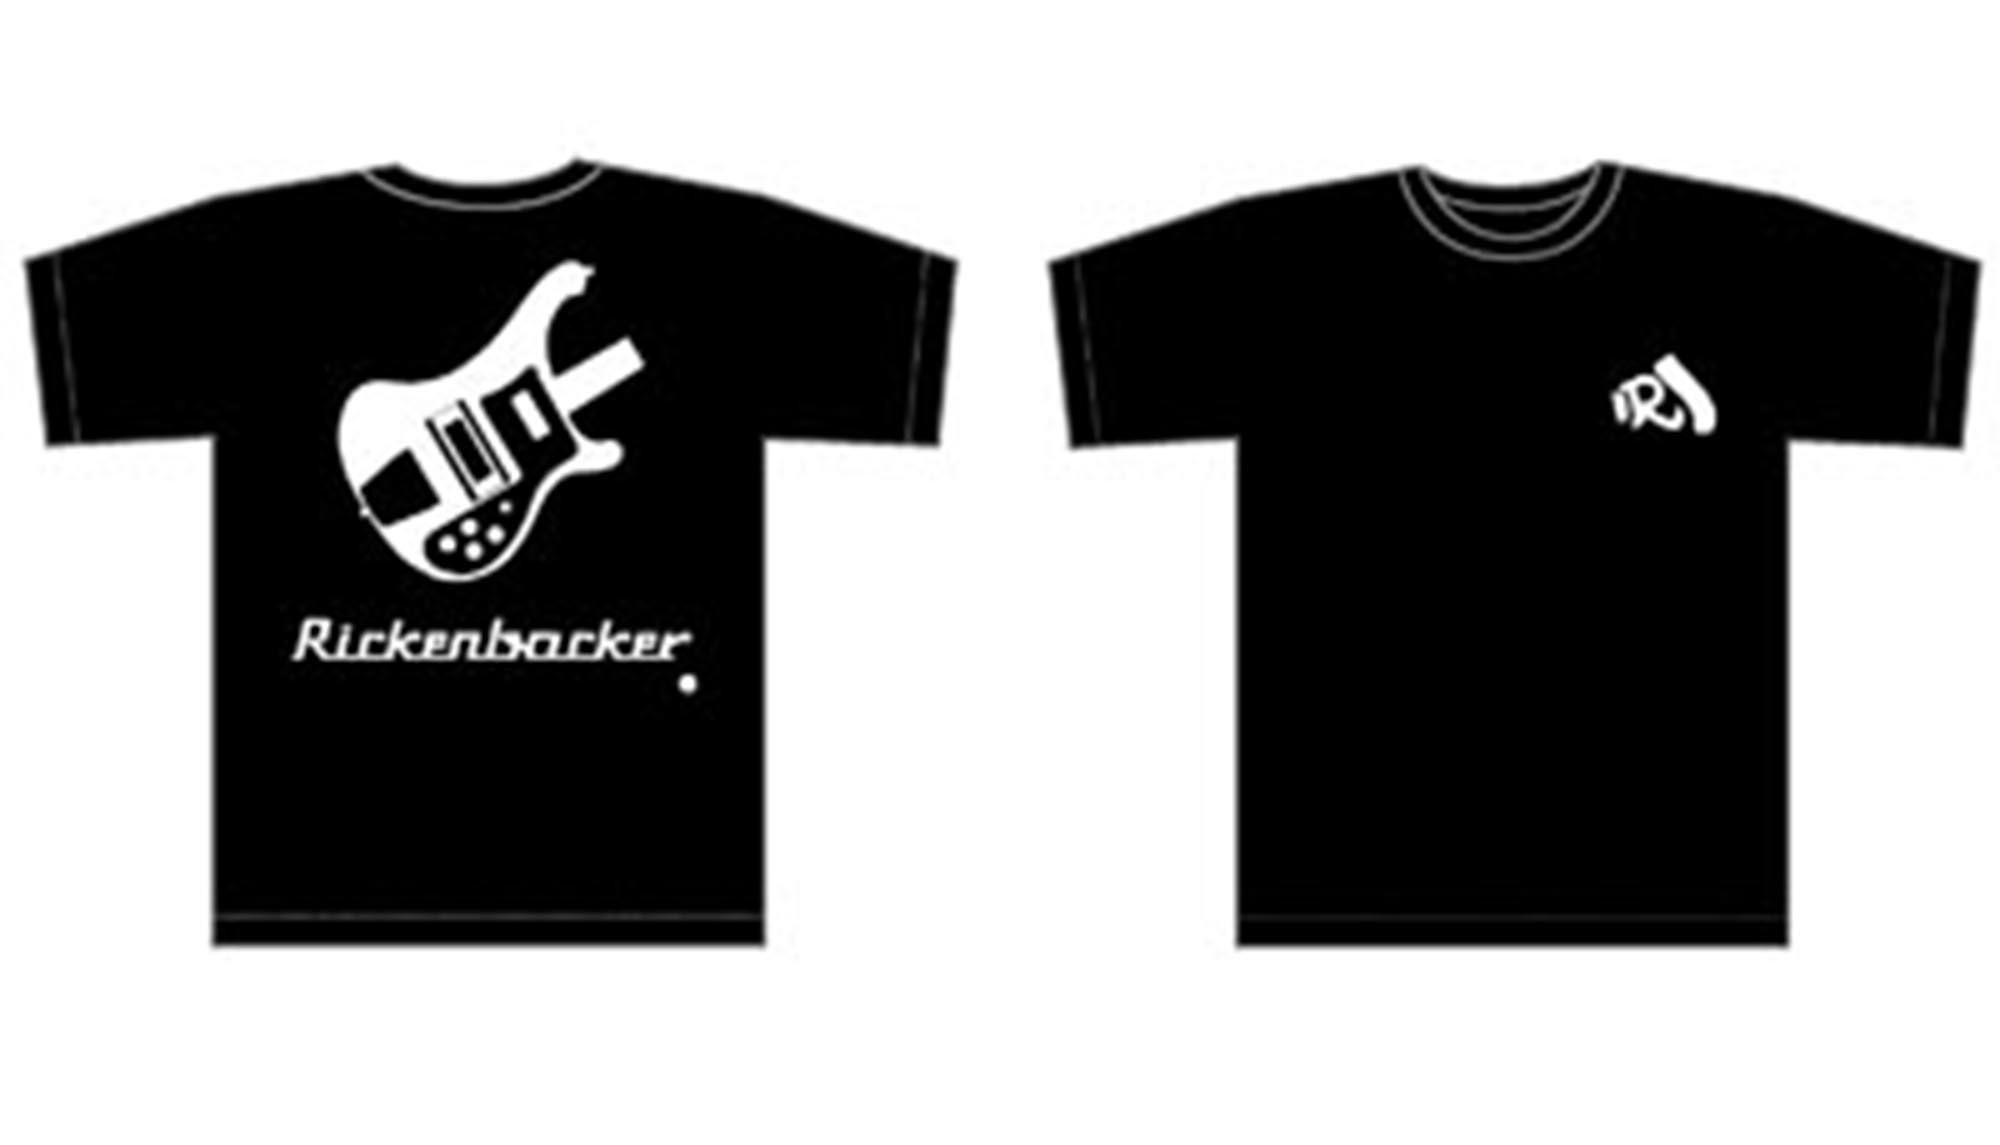 Rickenbacker Bass T-Shirt - Medium